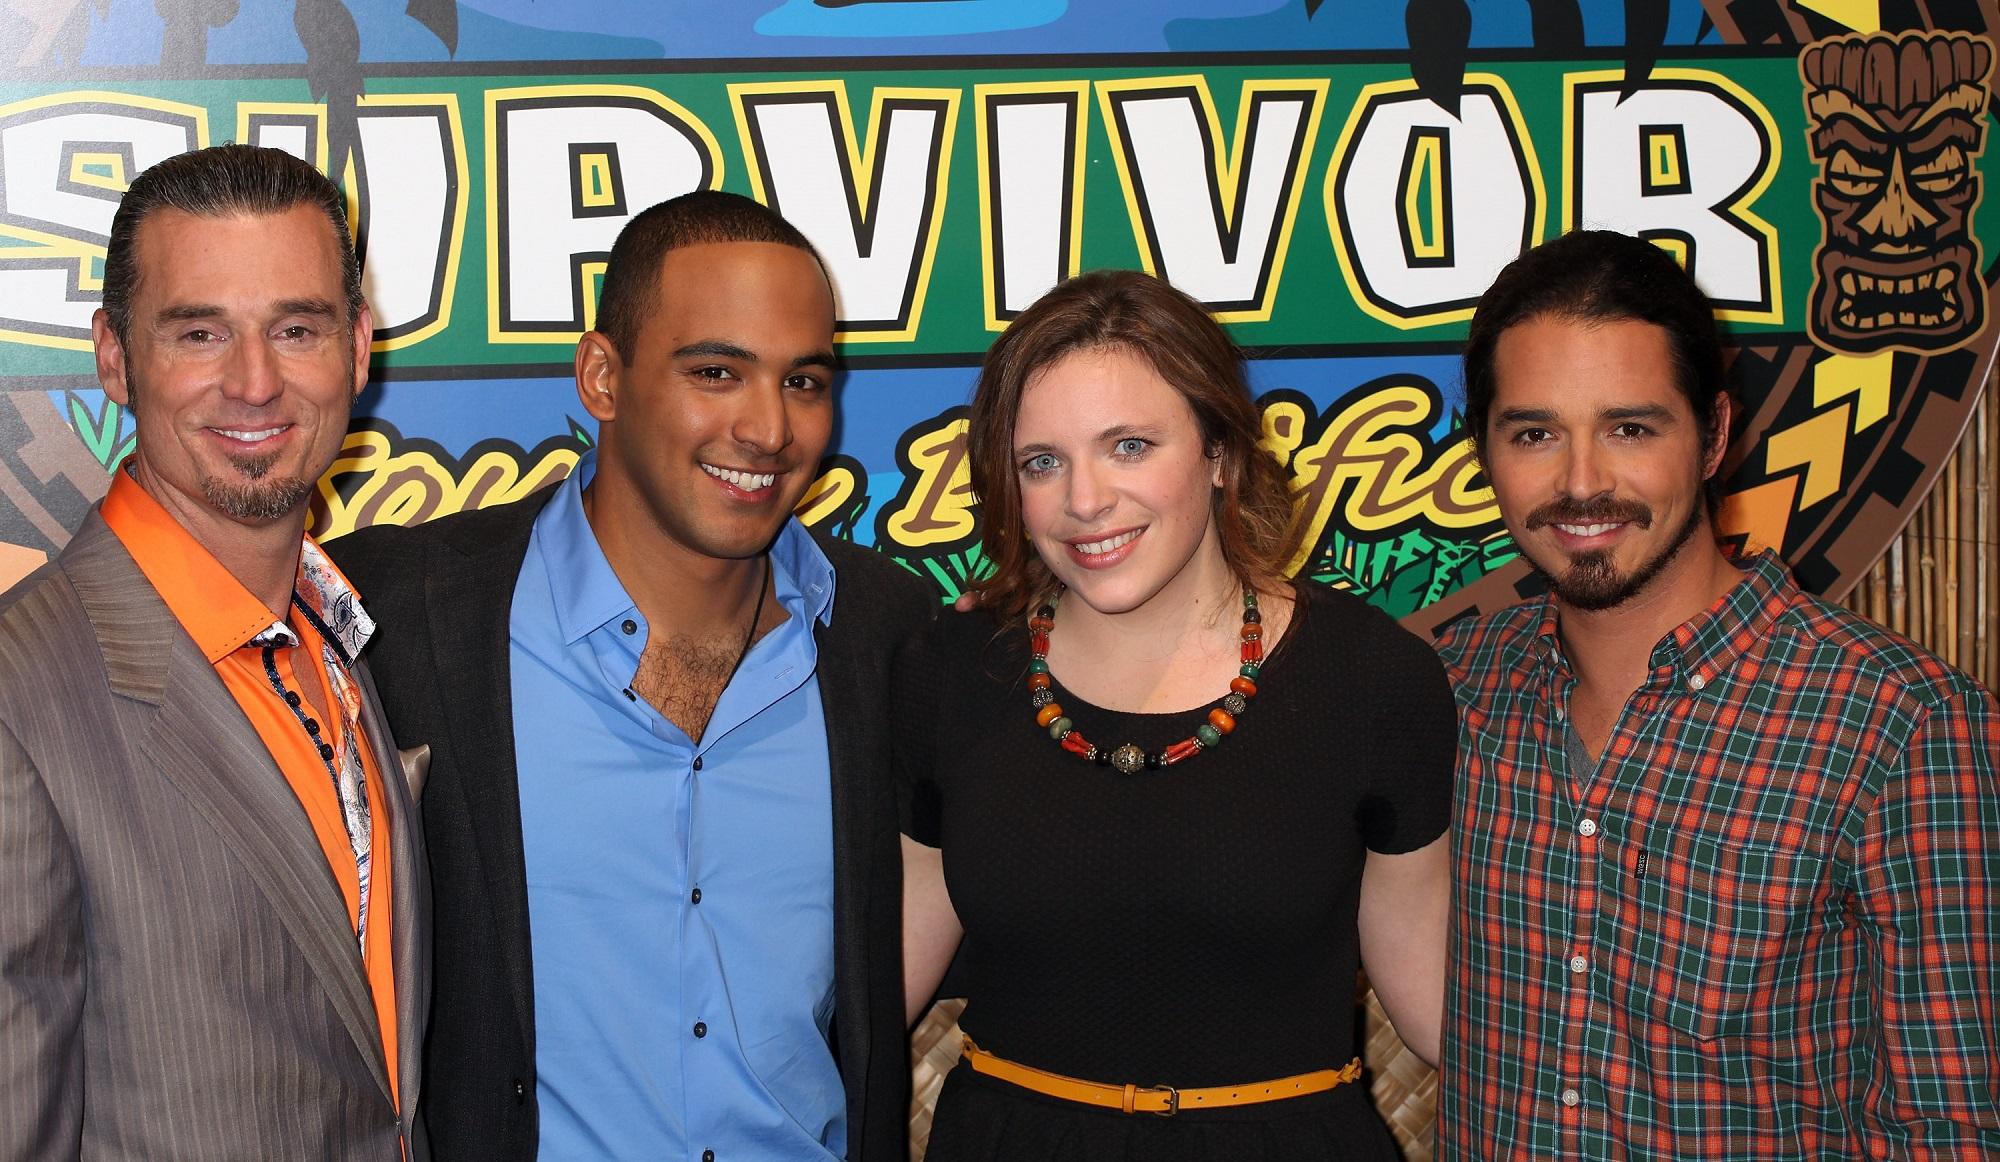 Benjamin 'Coach' Wade, Albert Destrade, Sophie Clarke, and Ozzy Lusth of Survivor: South Pacific